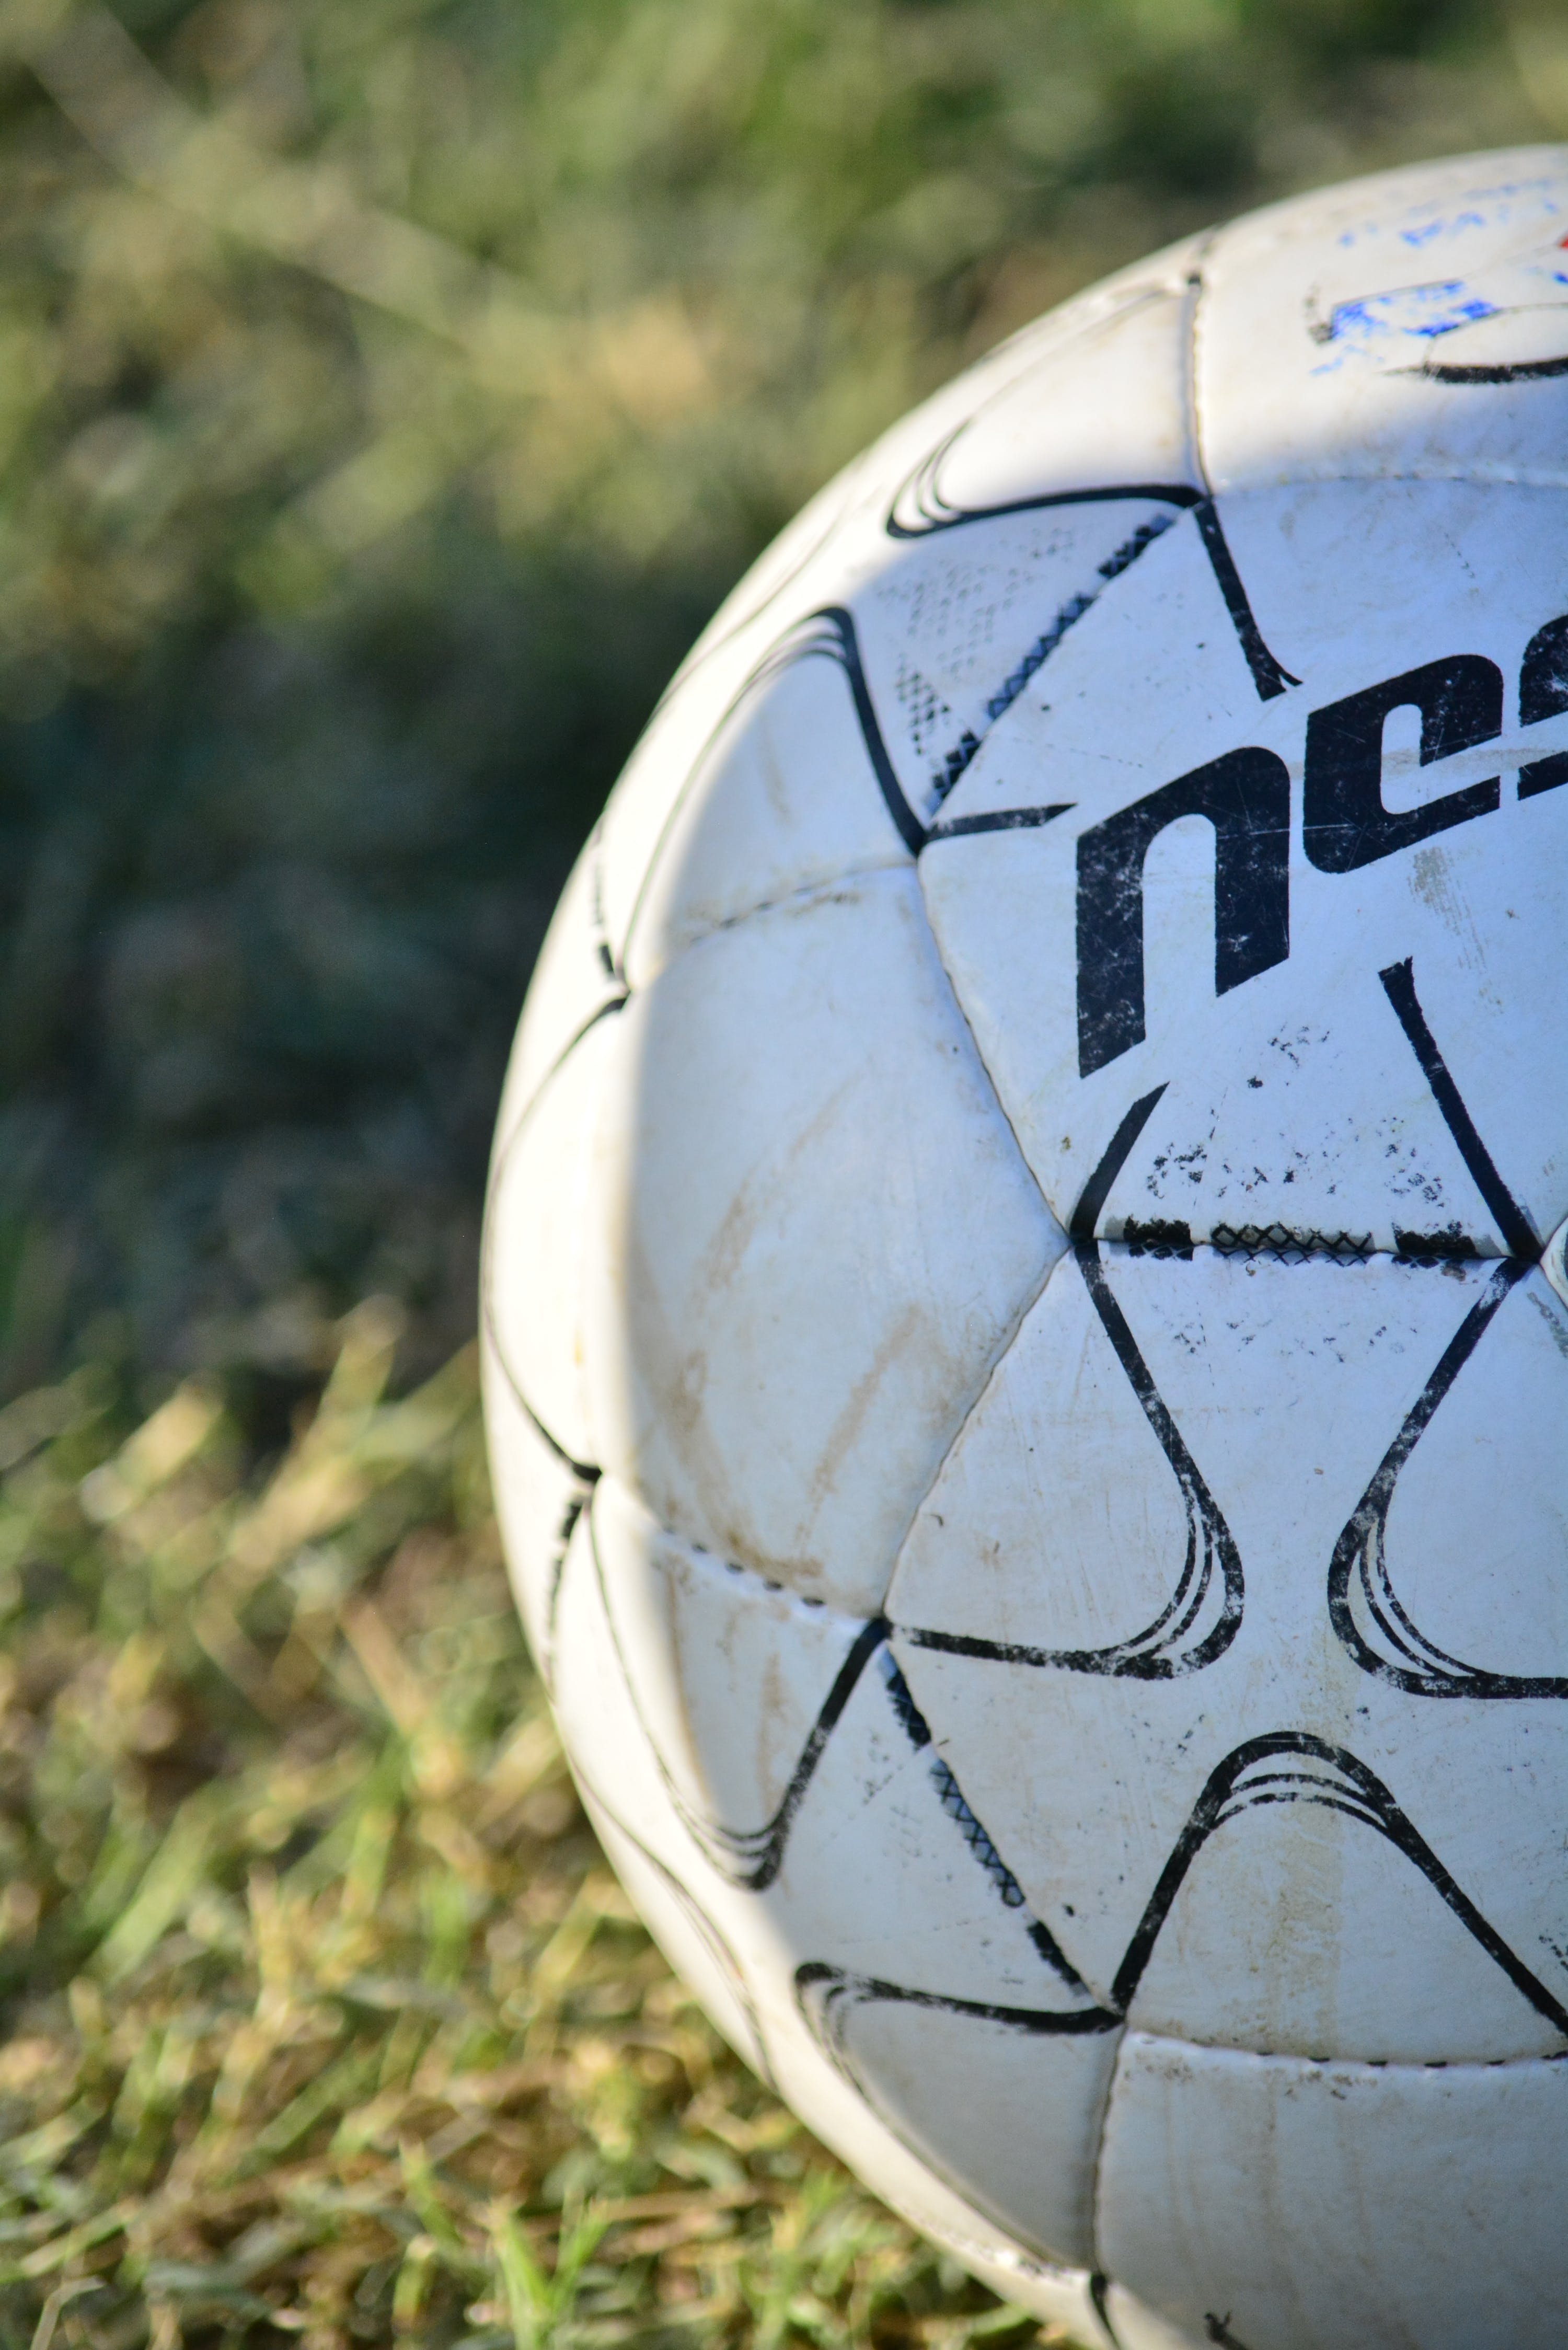 Kostenloses Stock Foto zu ball, football, fußball mädchen, fußball